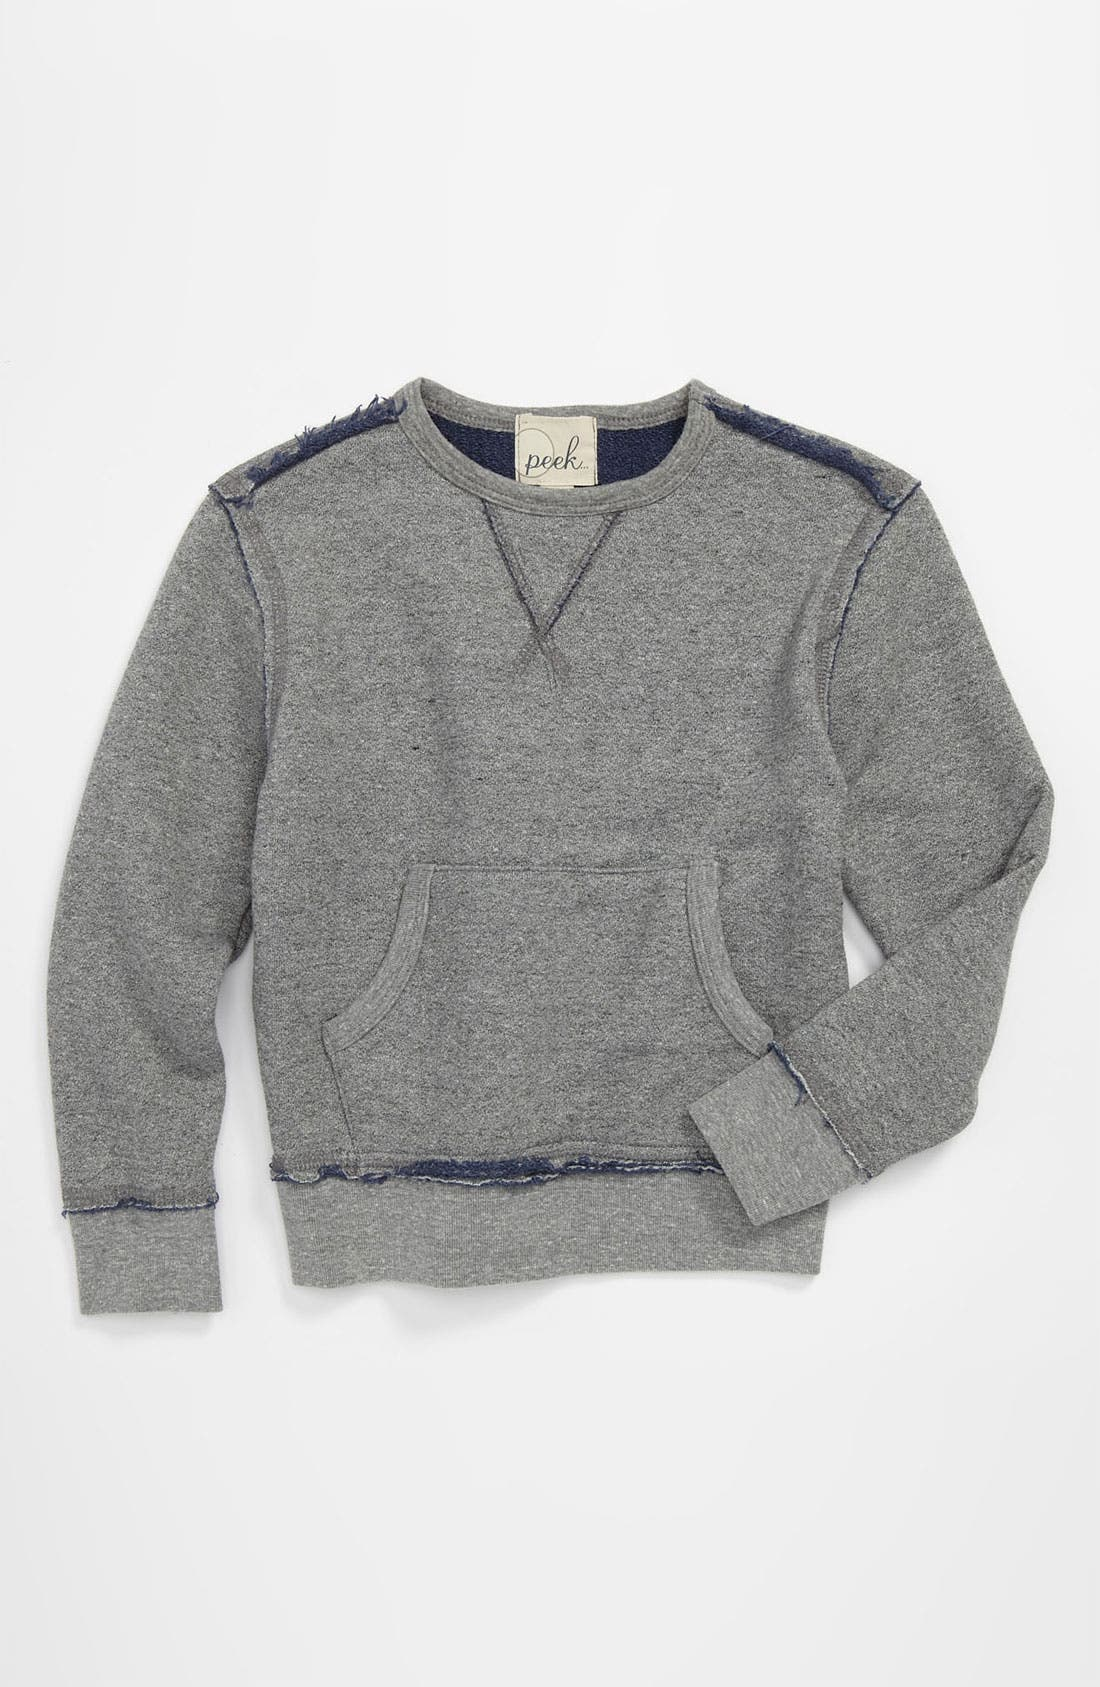 Alternate Image 1 Selected - Peek 'Bradley' Sweater (Little Boys & Big Boys)